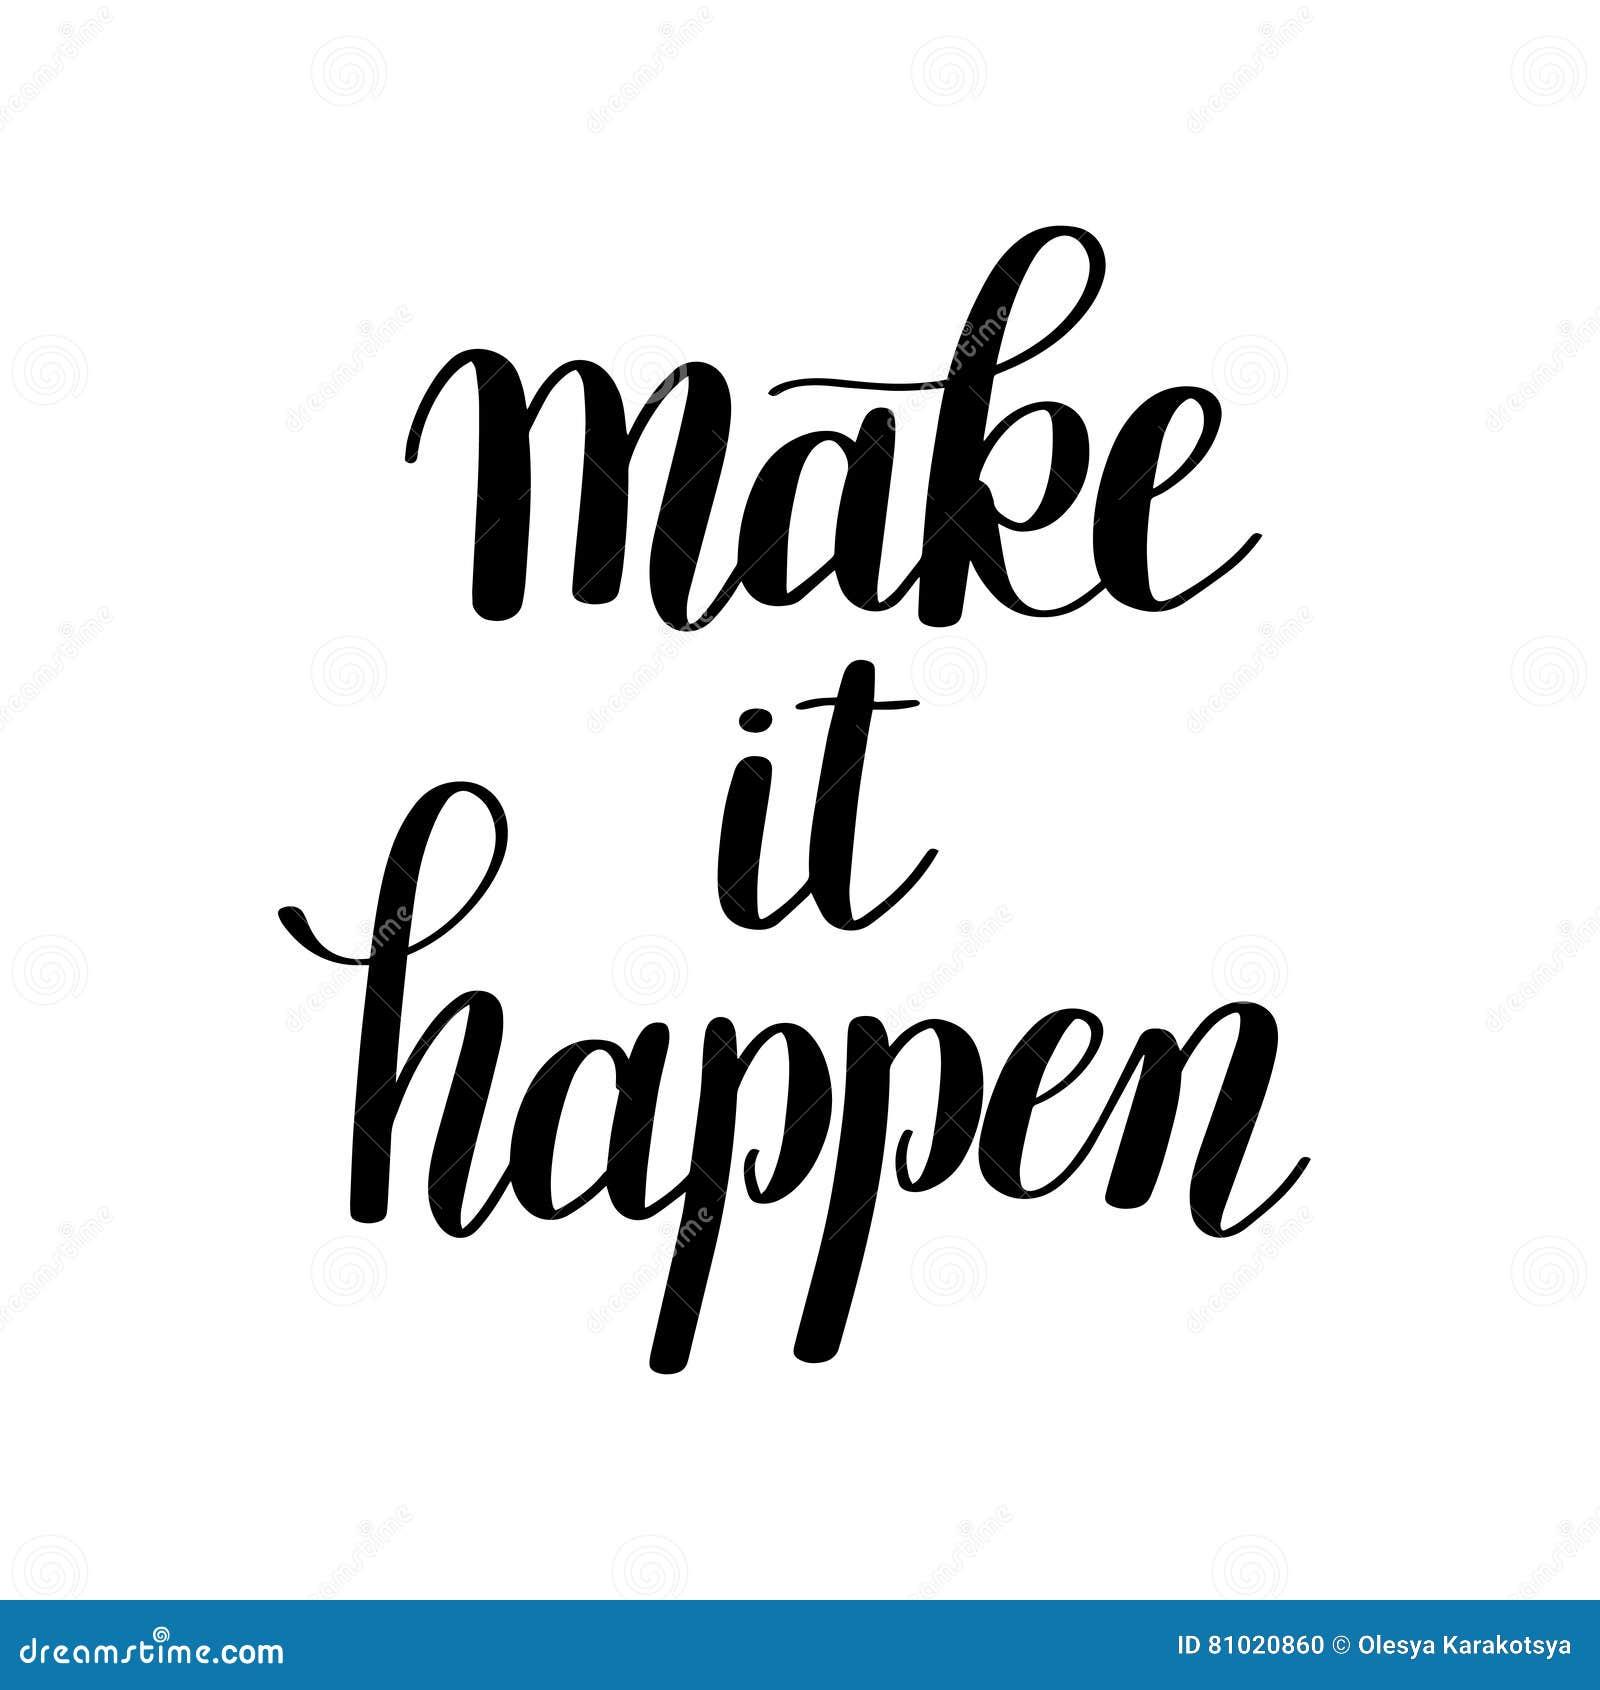 Quote Clip Art: Make It Happen Handwritten Positive Inspirational Quote